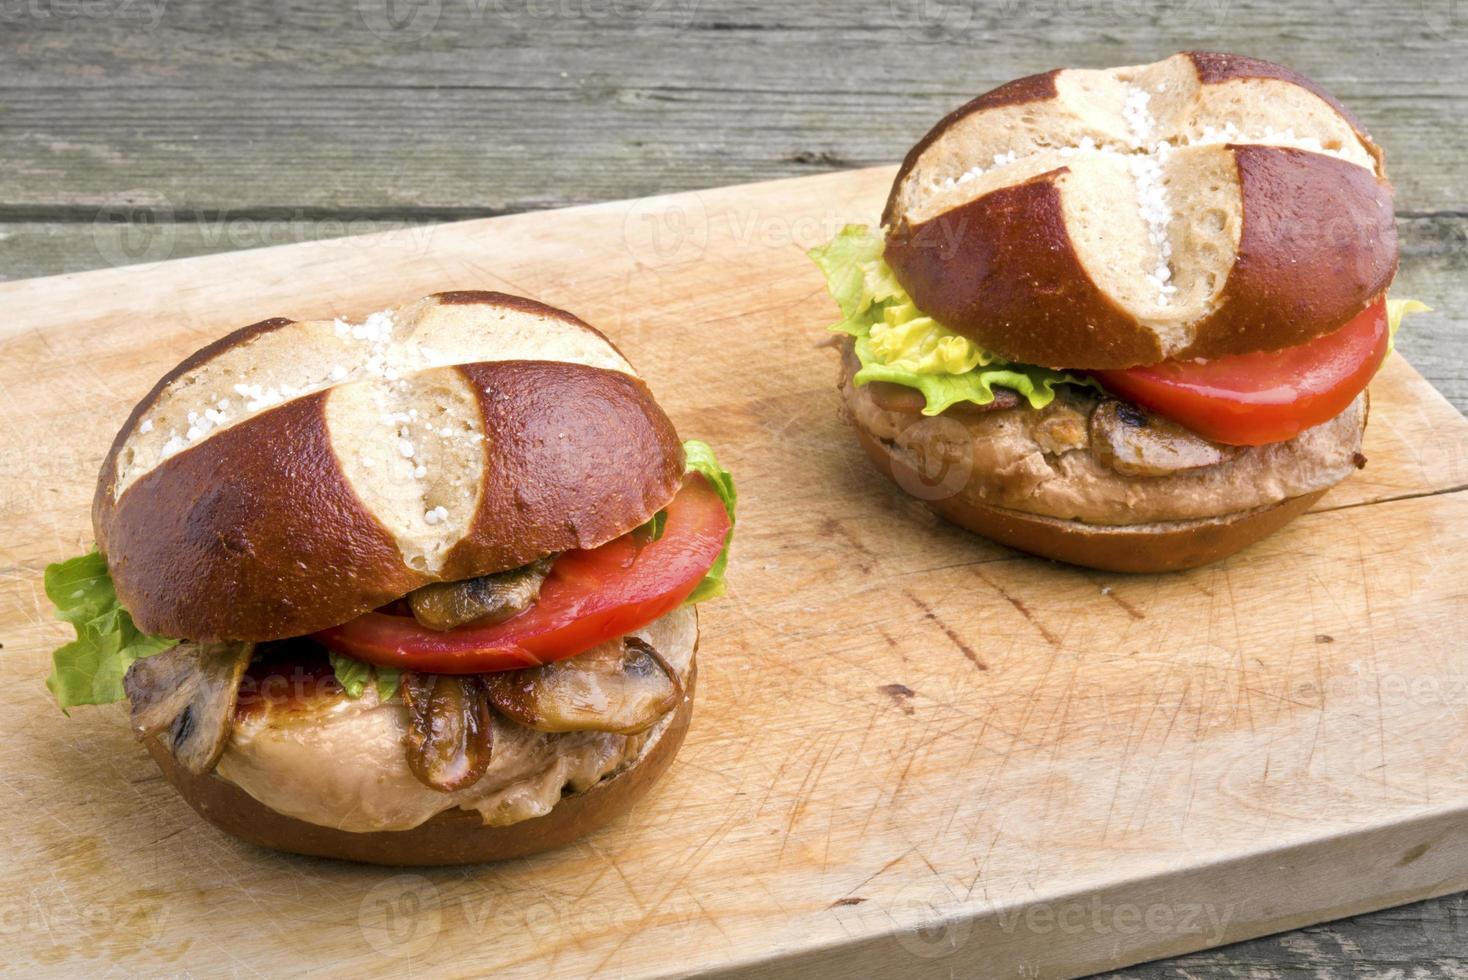 sanduíche de bife de porco grelhado (hambúrguer) com cogumelos foto